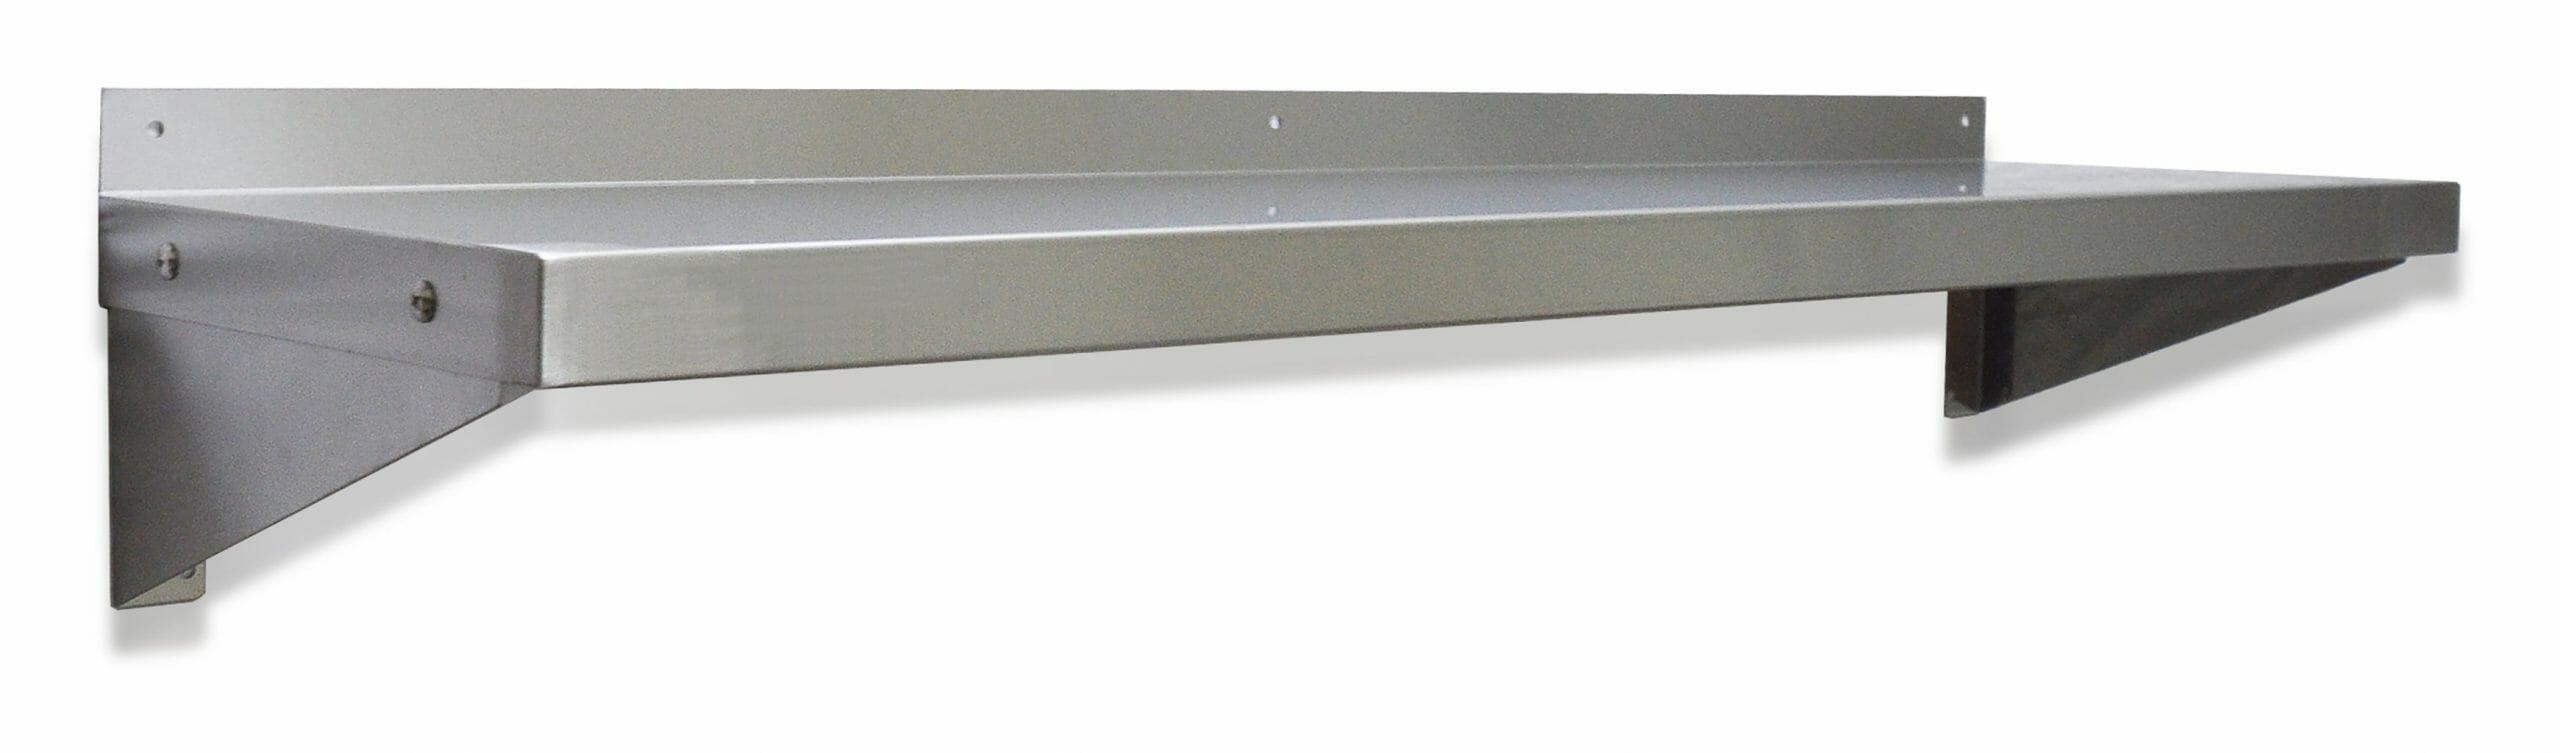 Stainless Steel Wall Shelves, 1200 X 300mm deep.